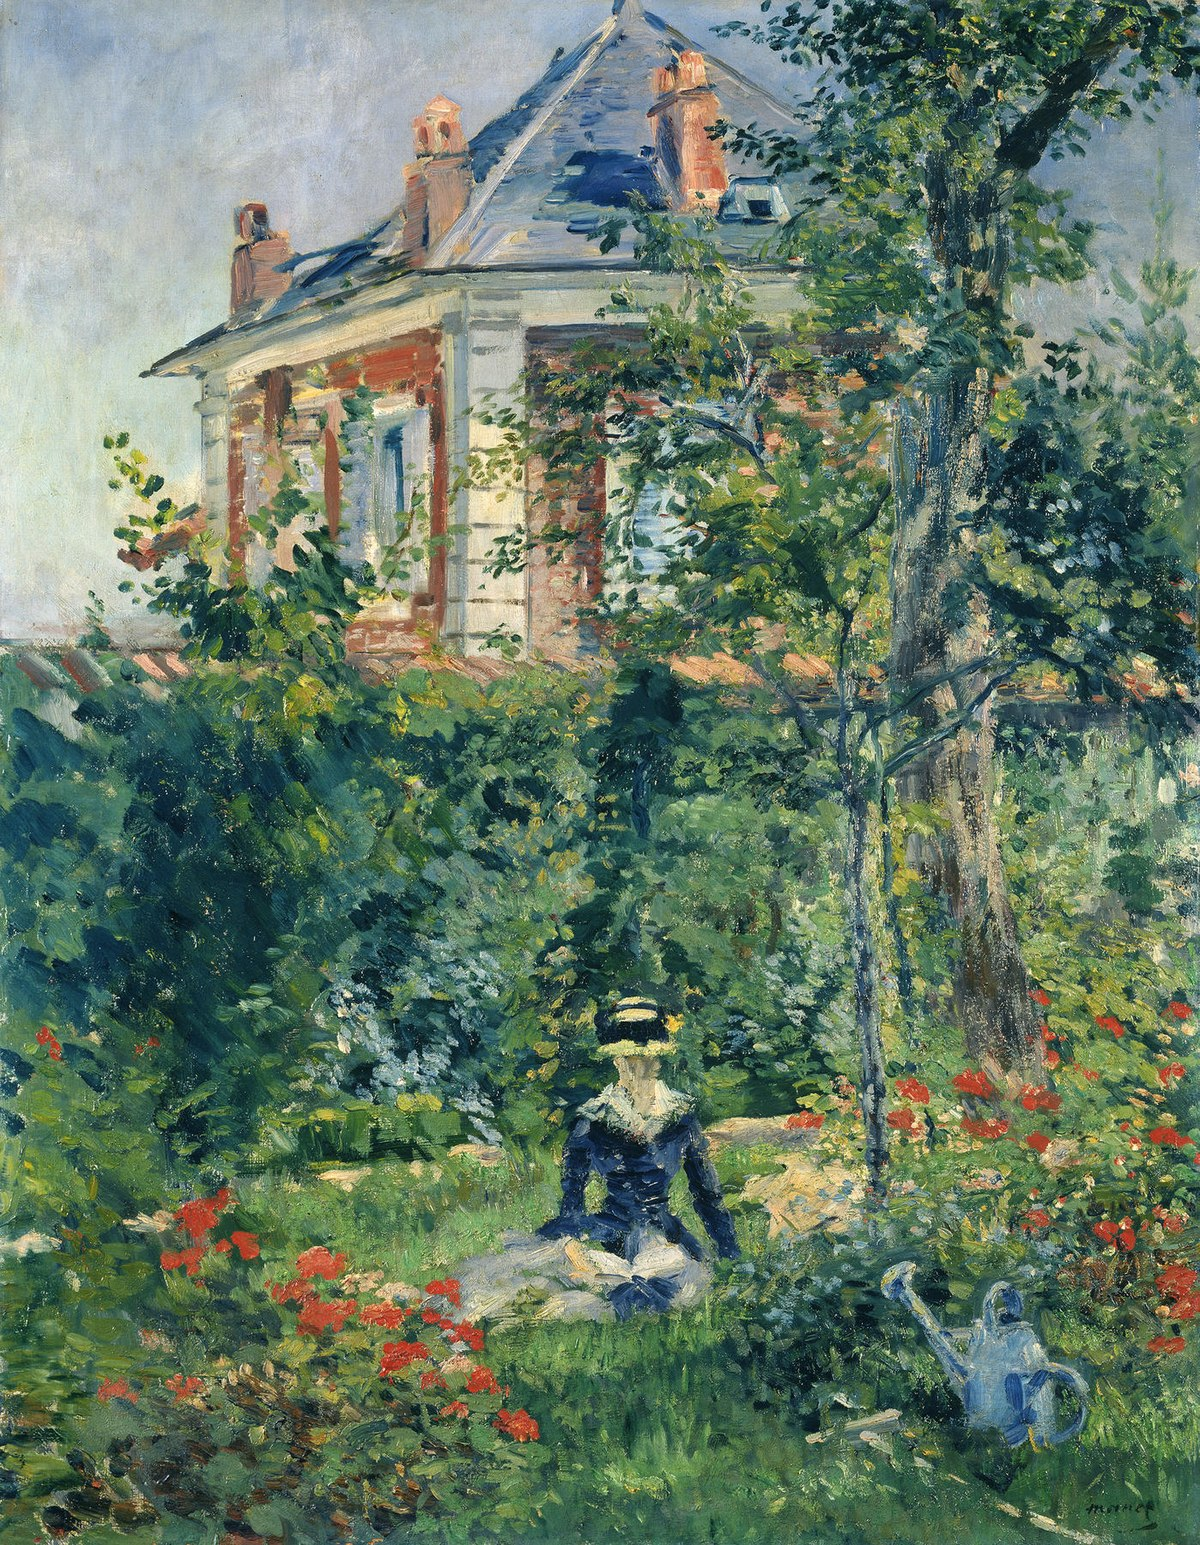 Edouard Manet - Girl in the Garden at Bellevue.JPG